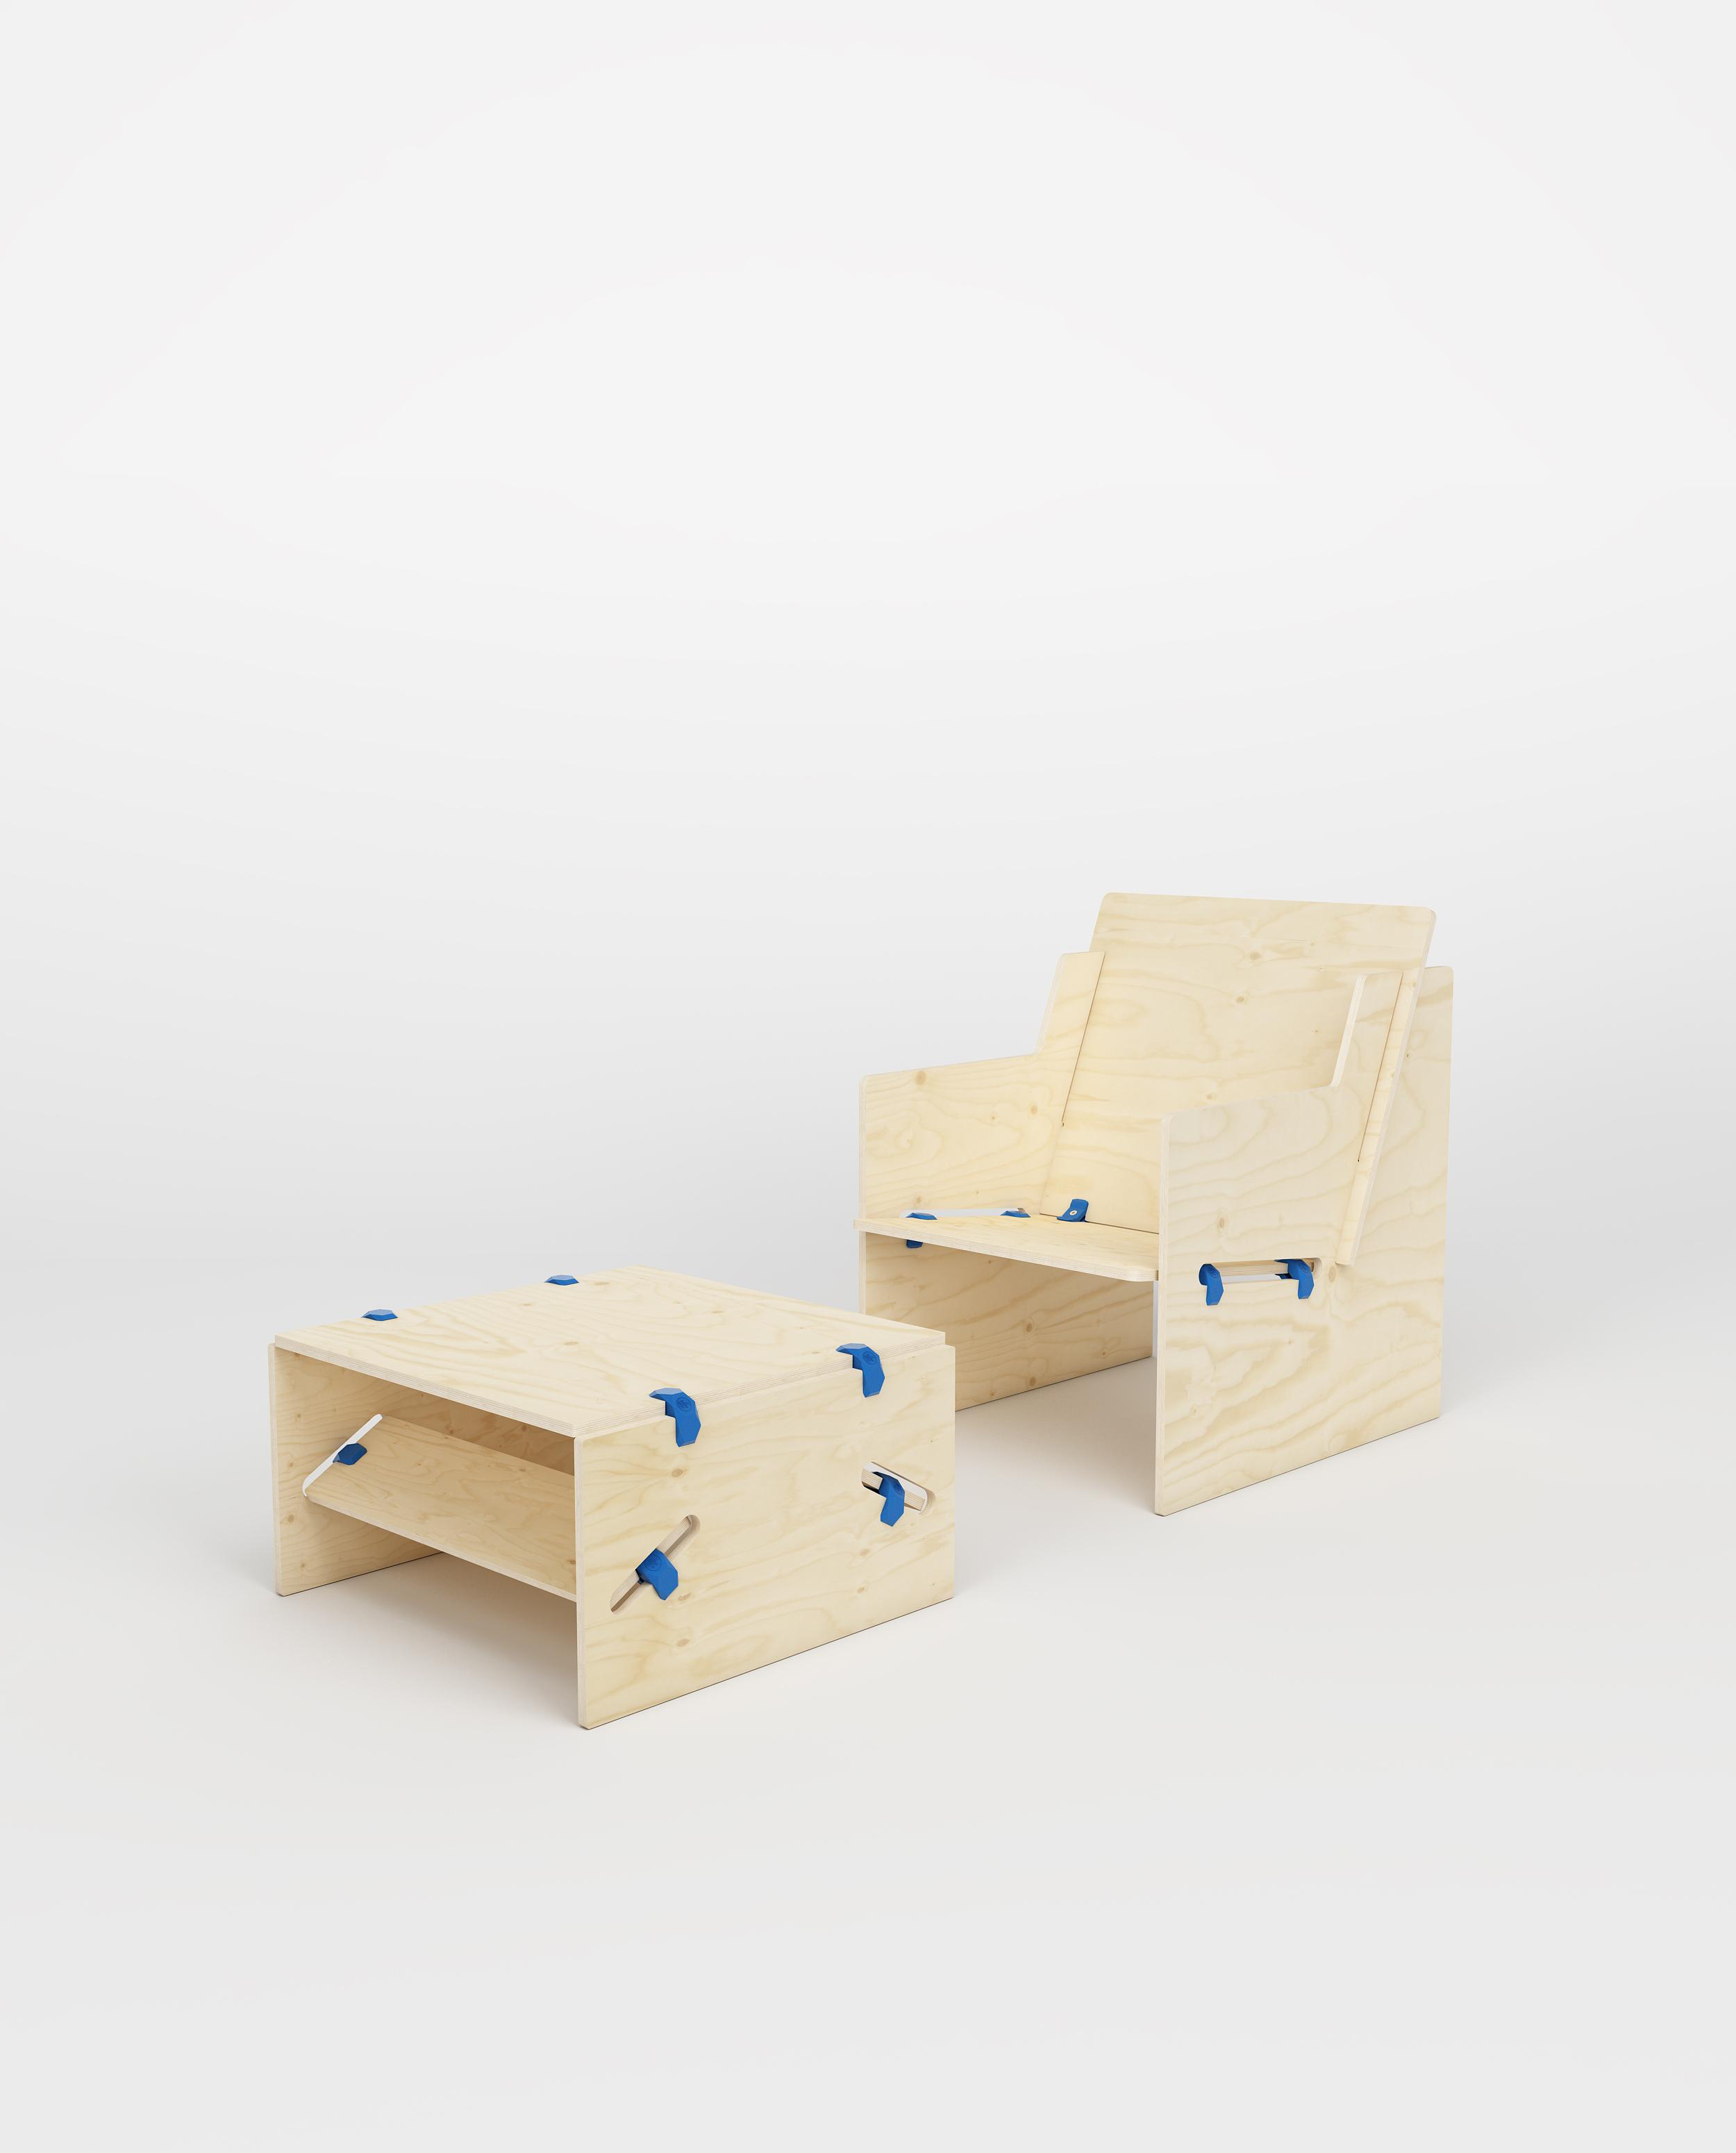 Ruim_armchair_coffee table_playwood_pro.jpg